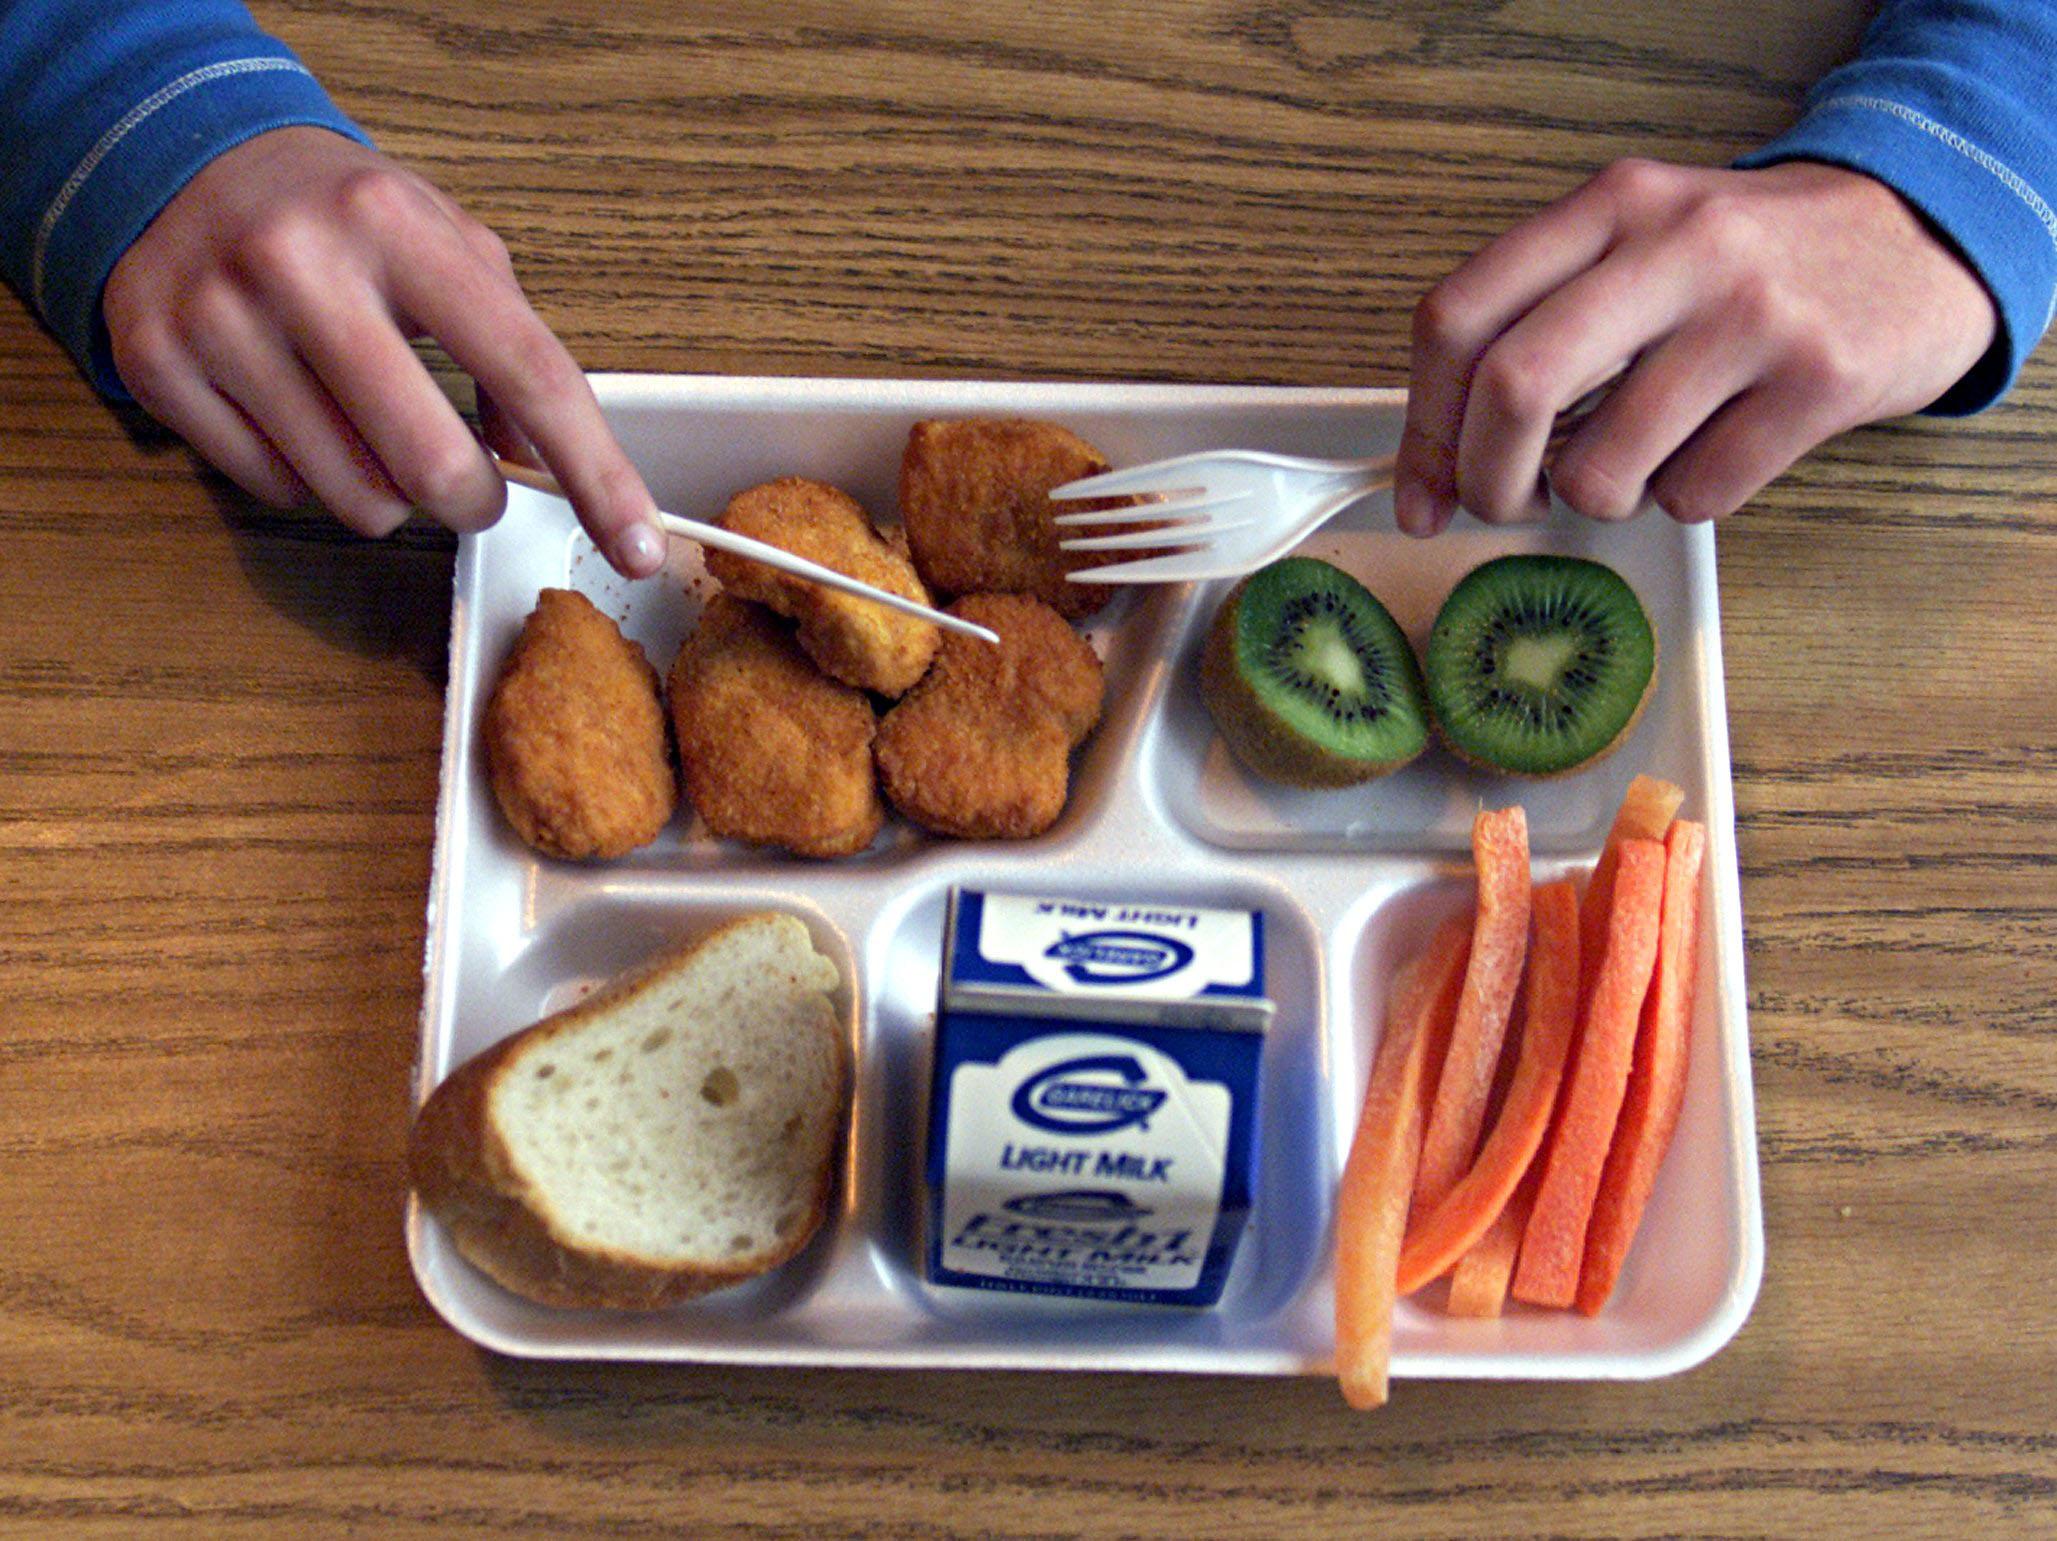 MinnesotaReduceGMOinSchools.jpg